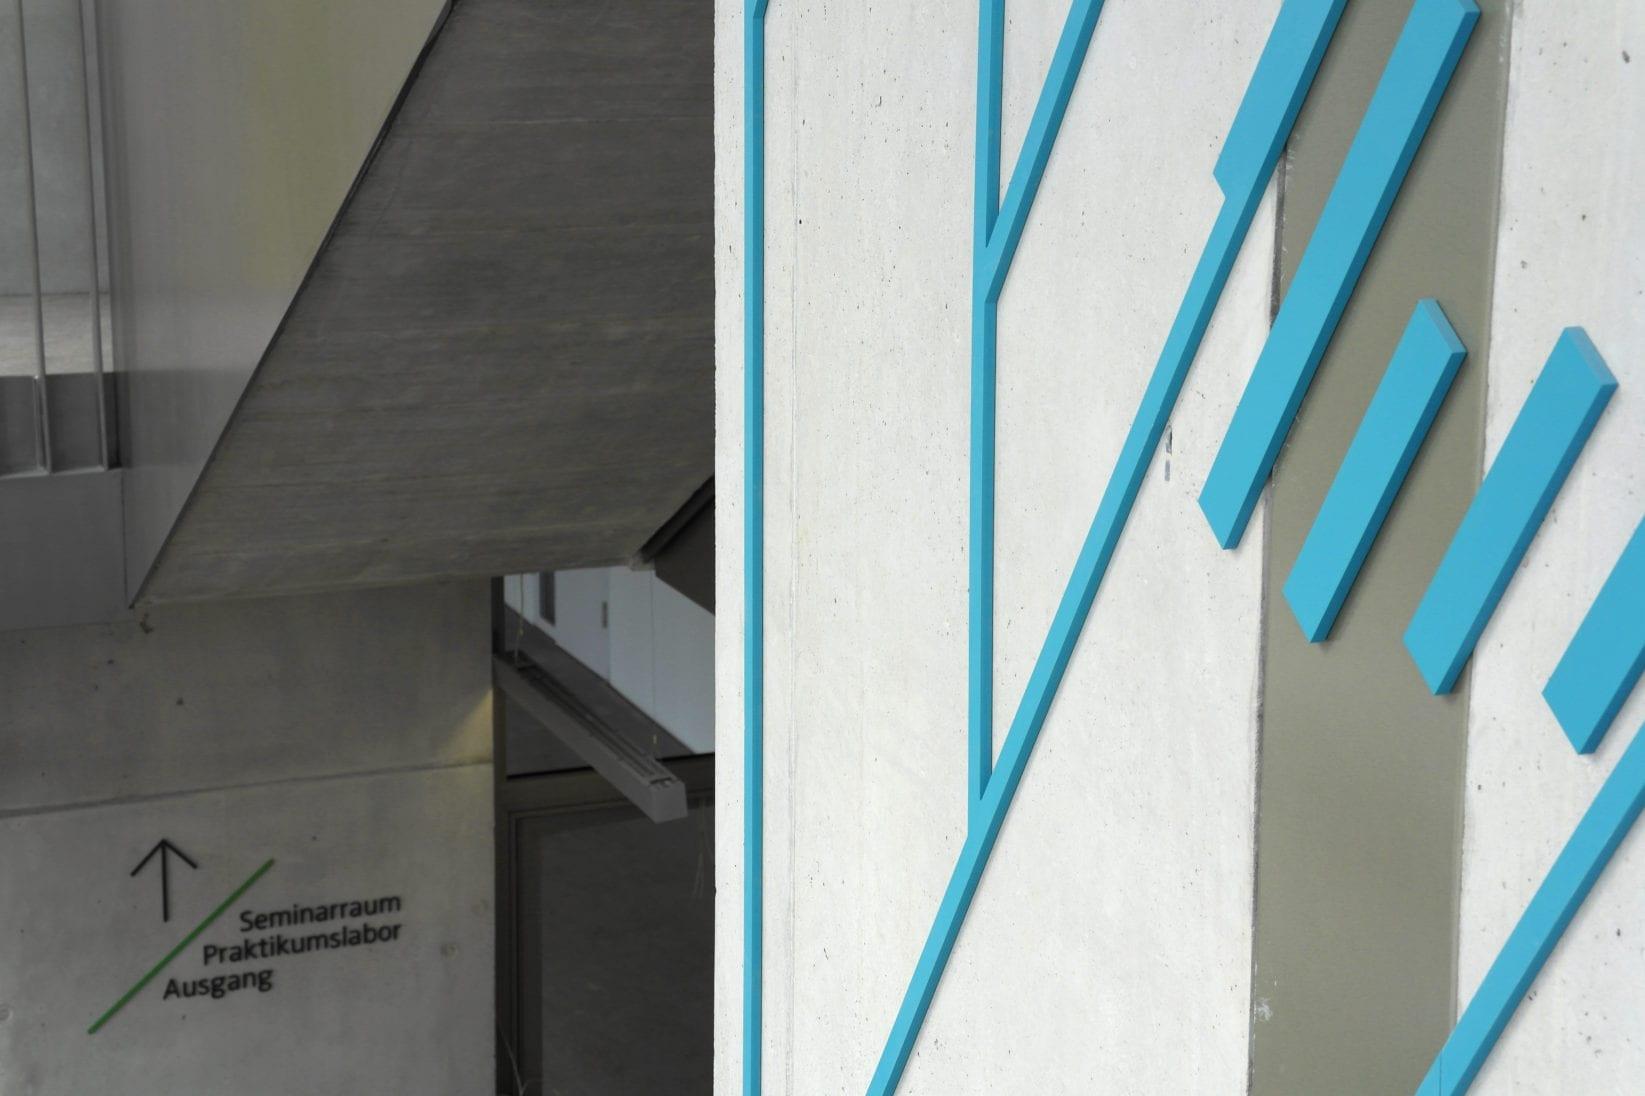 ZMBP Wegweiser Treppenhaus